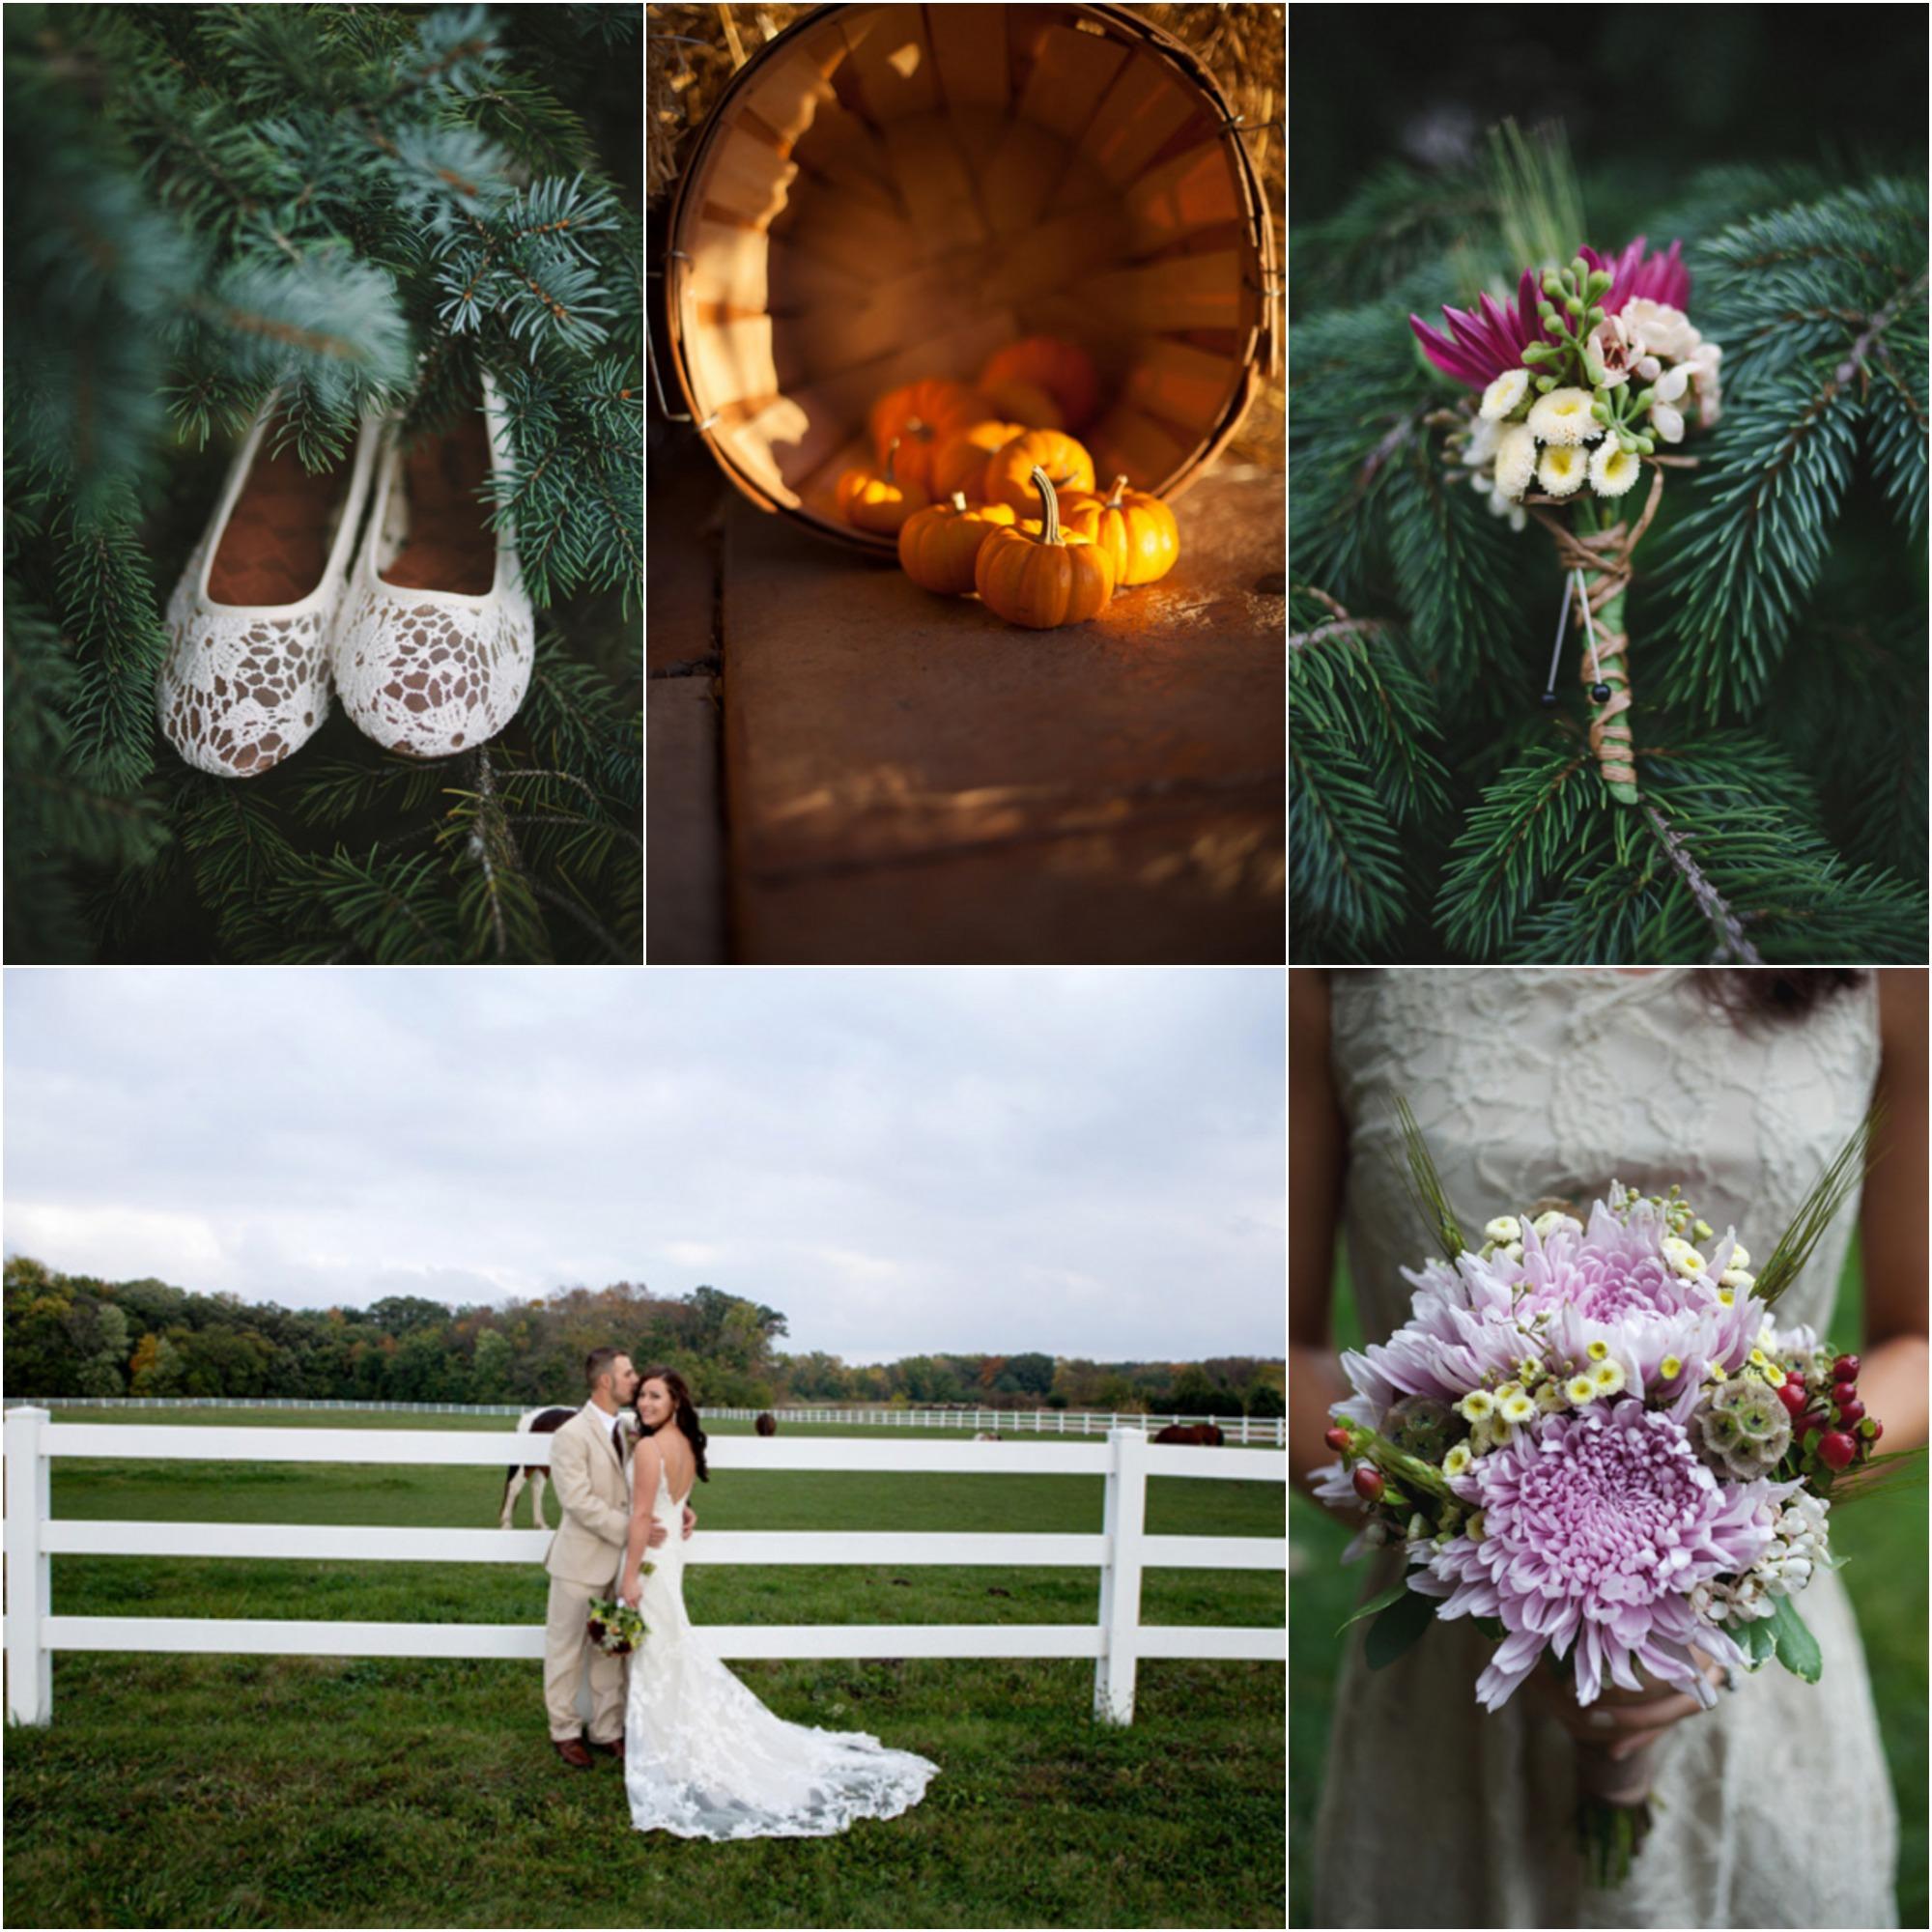 Autumn Country Farm Wedding